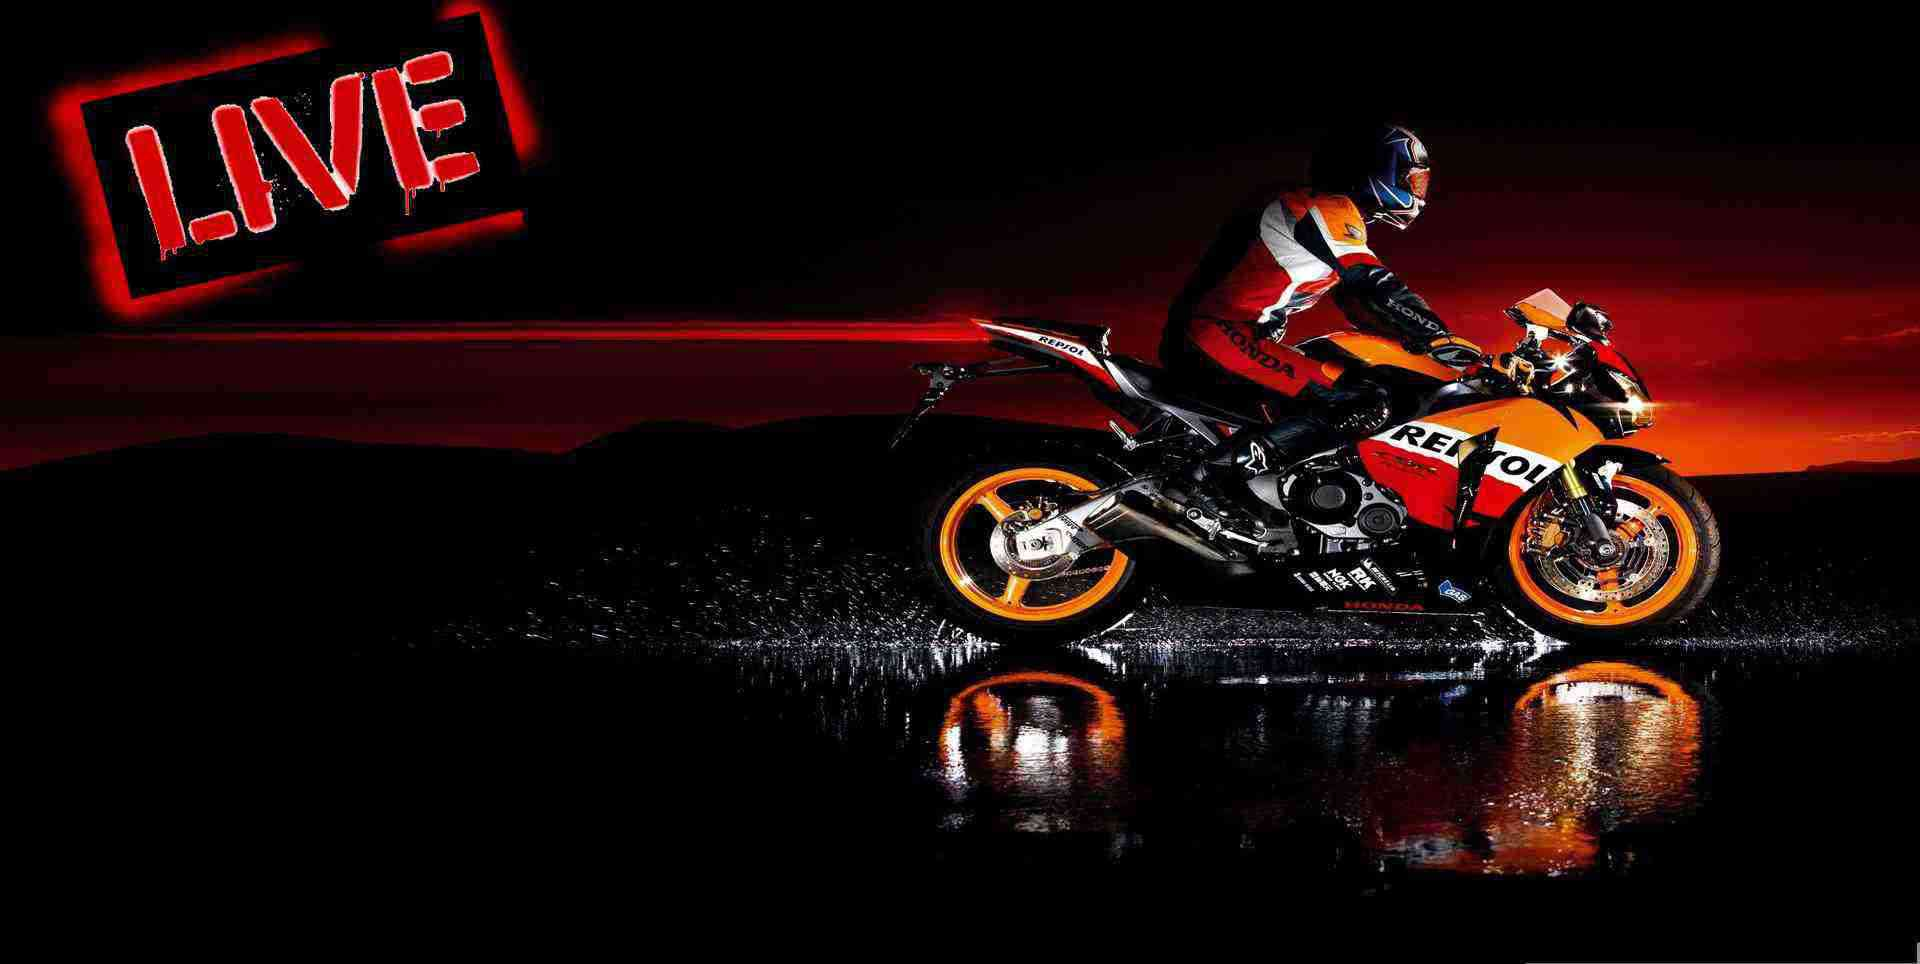 motogp-grand-prix-of-czech-republic-2015-streaming